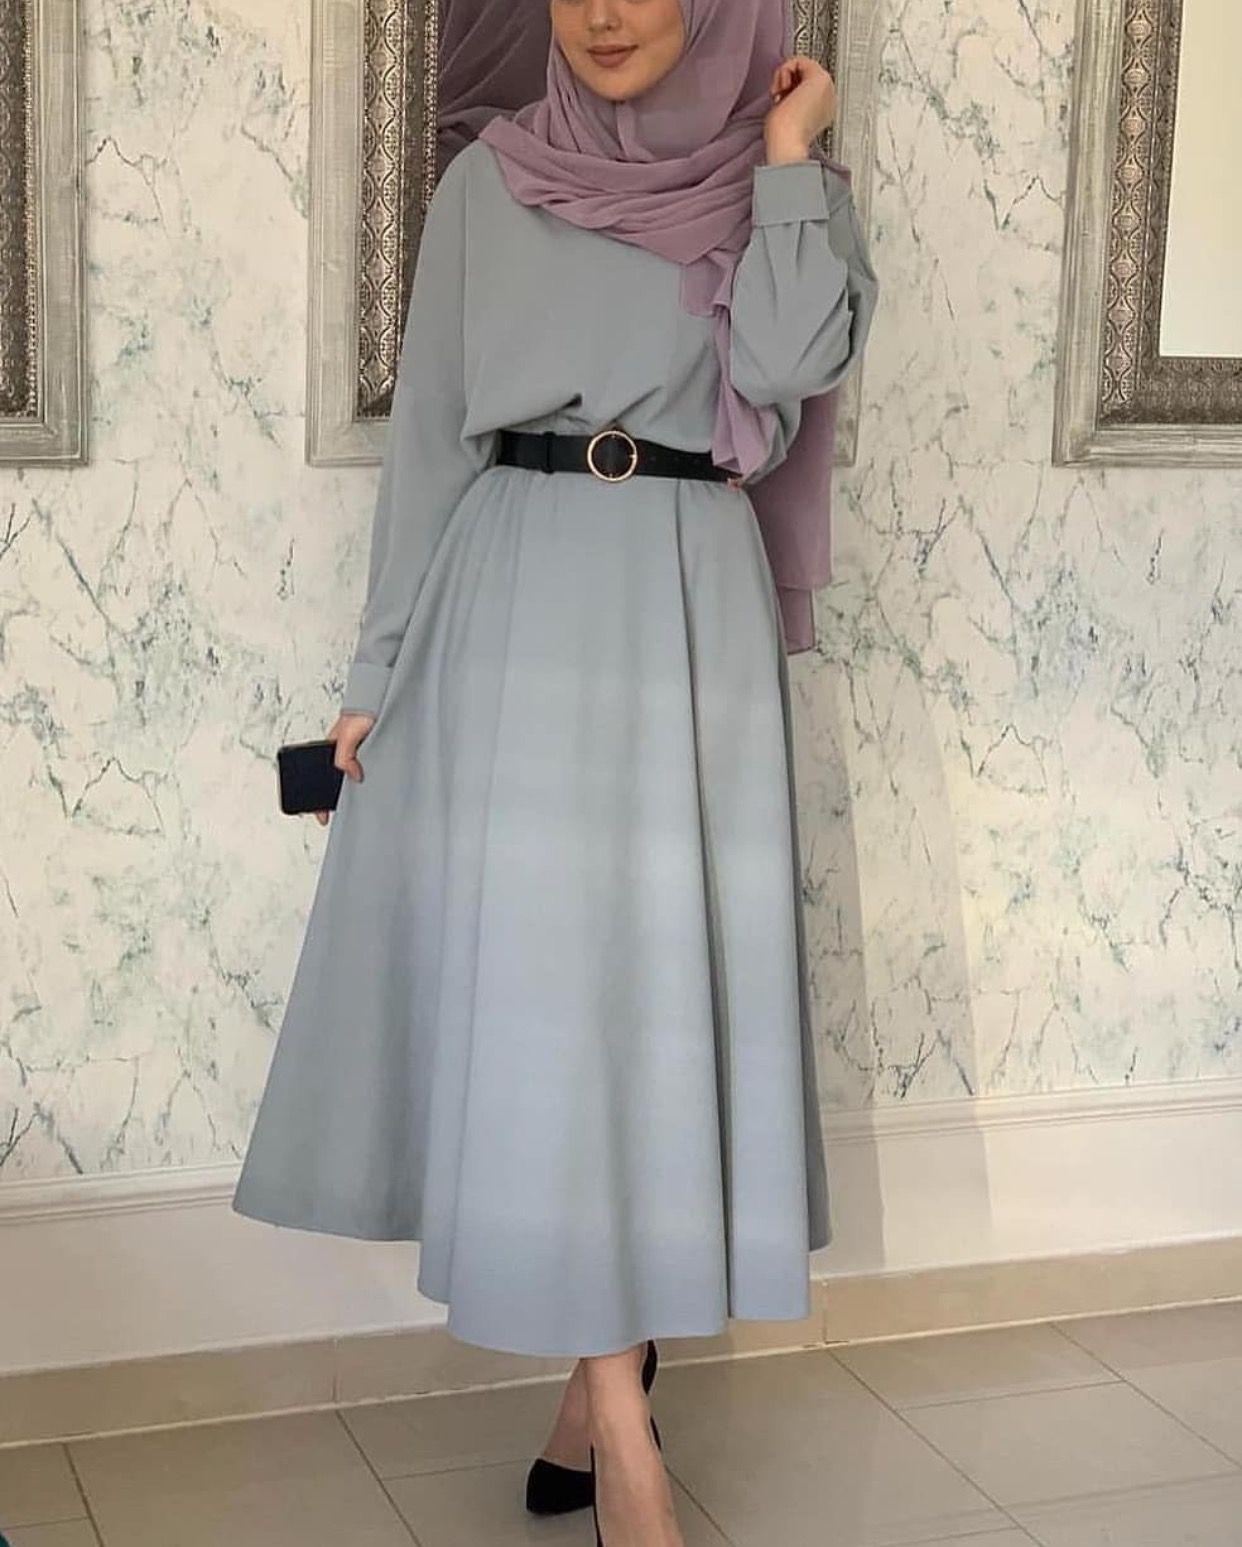 c2d9cbeed3625 Pin by mahanti on hijab ootd✨ in 2019   Hijab fashion, Fashion, Hijab outfit